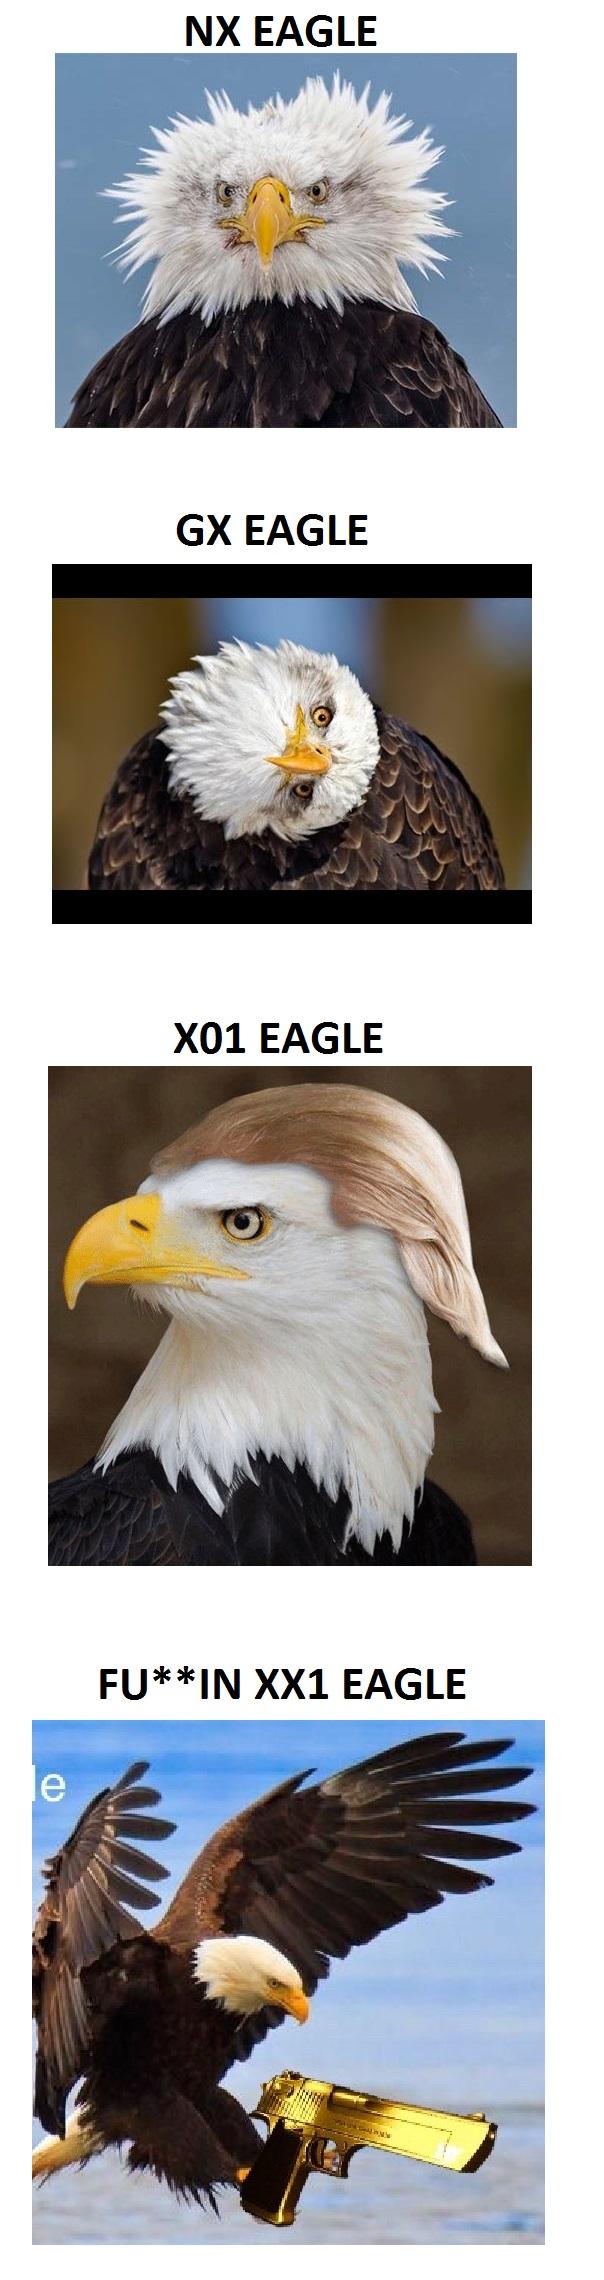 Eagle Meme.jpg